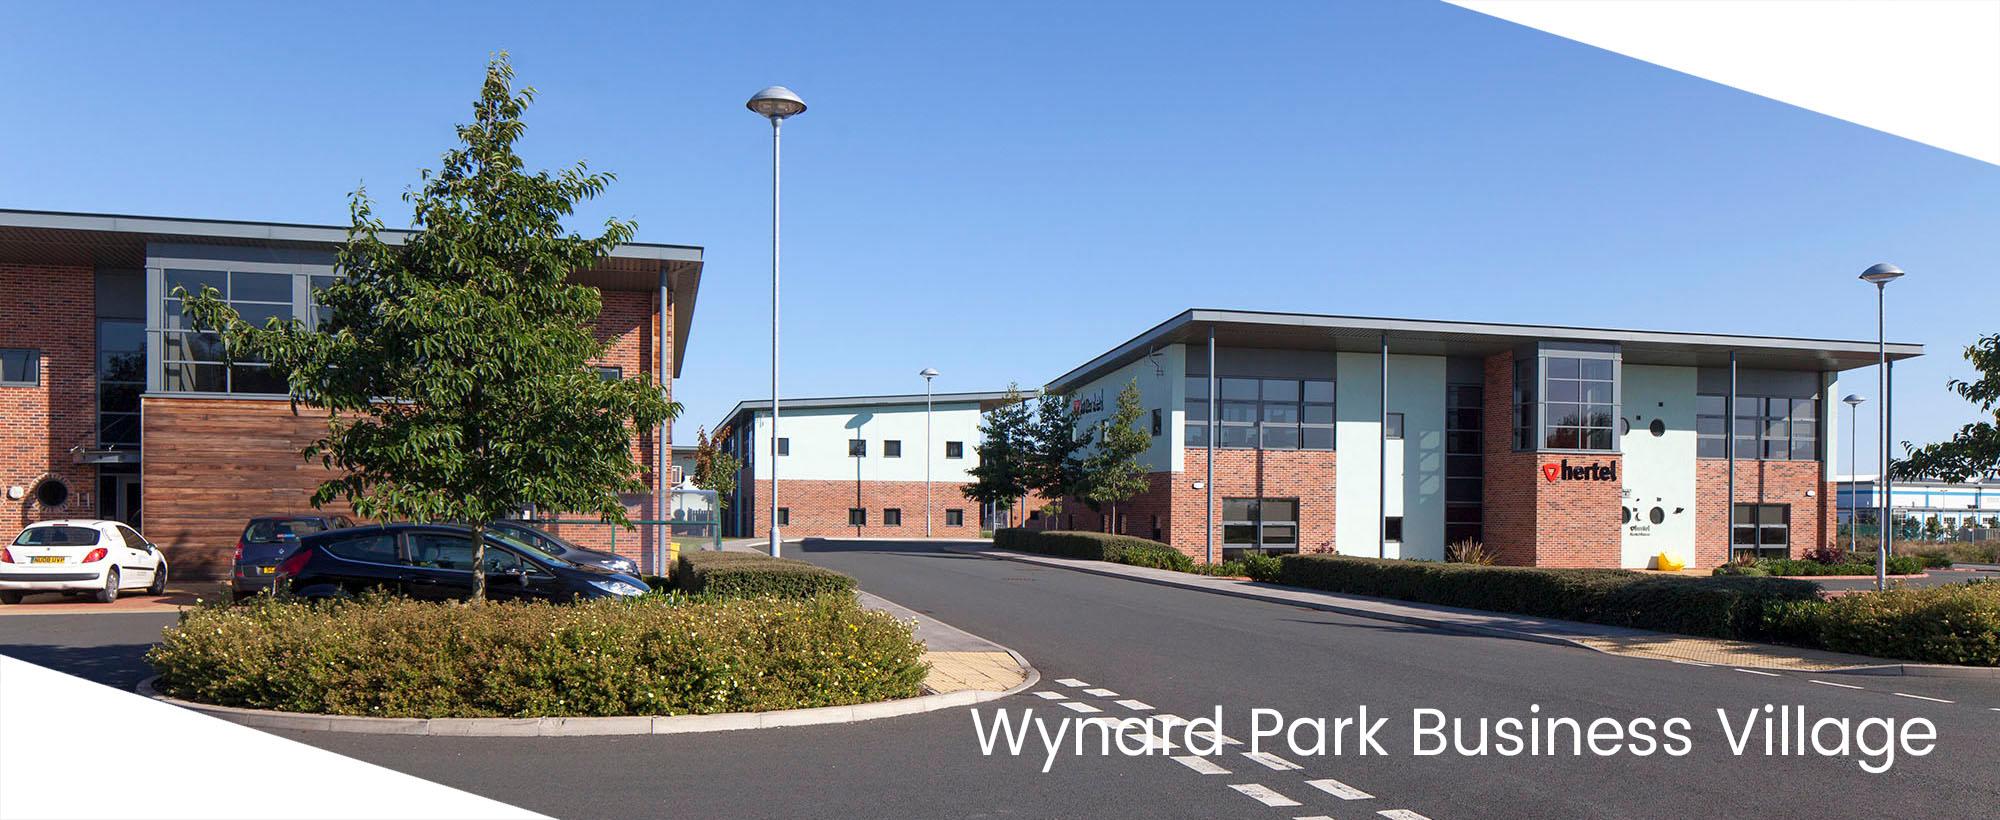 Niven Architects - Wynard Park Business Village.jpg